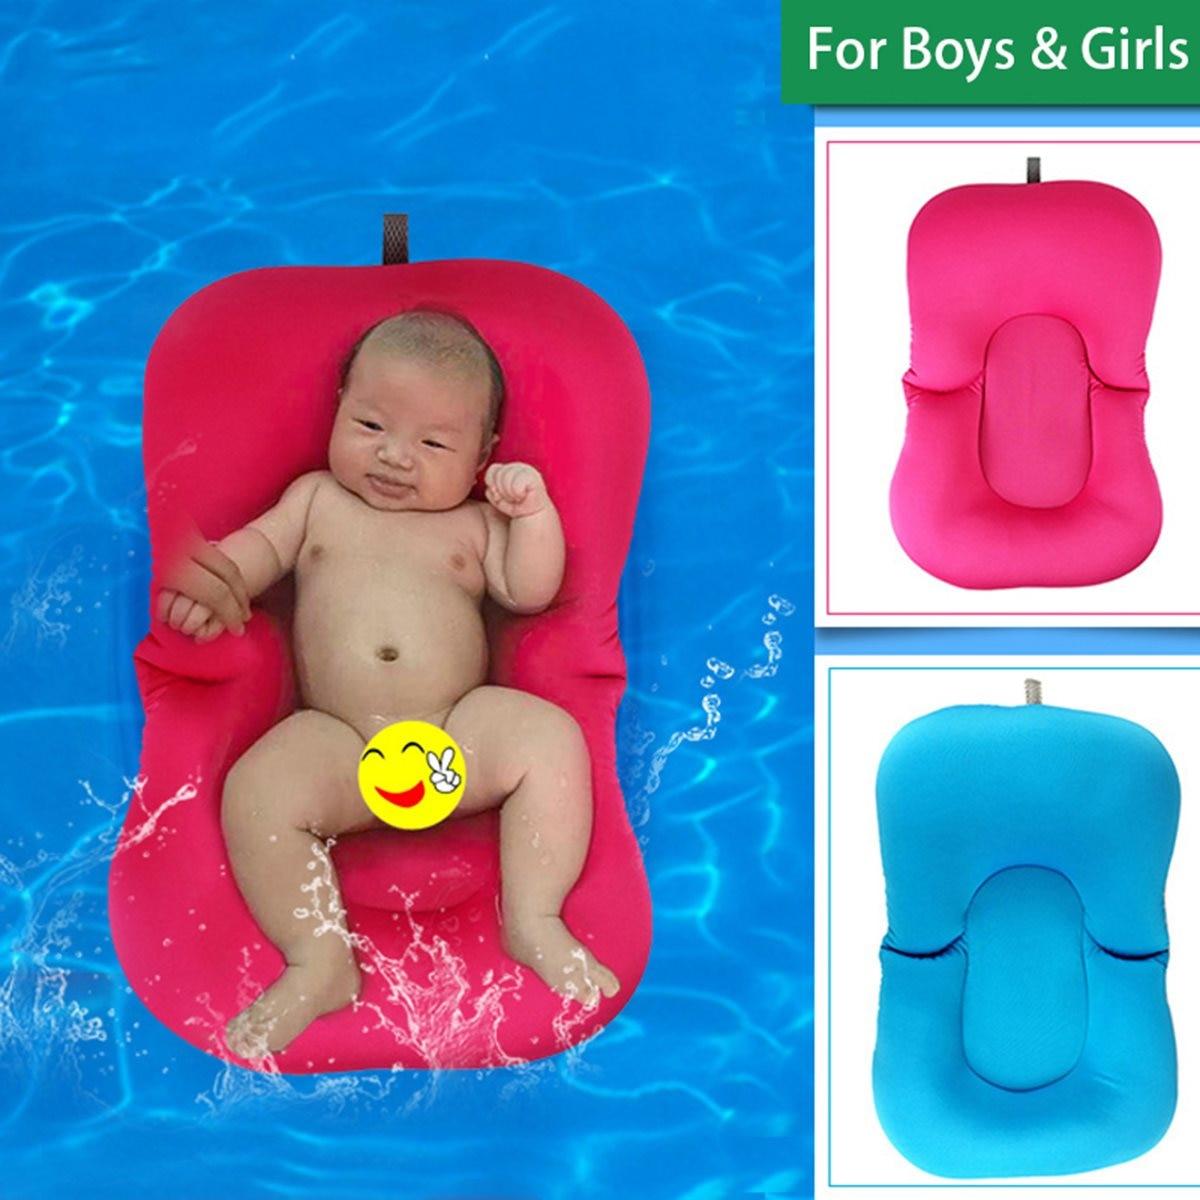 Elastic Fabric Baby Bath Tub Pillow Pad Lounger Air Cushion Floating ...